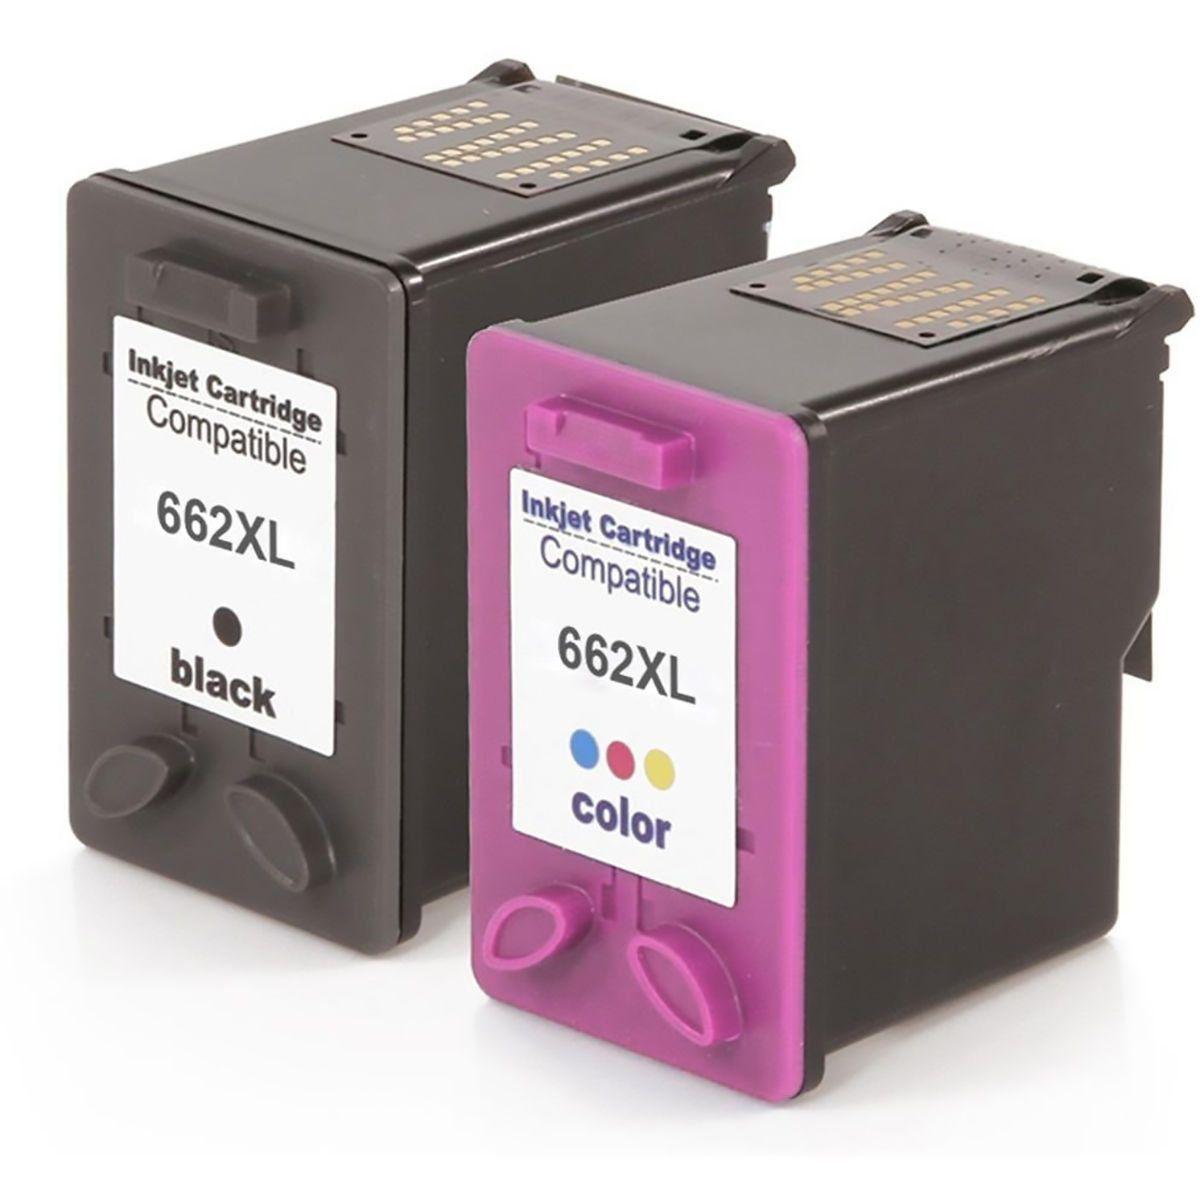 Compatível: Kit Colorido de Cartucho de Tinta 662xl 662 para Impressora HP 2515 2516 3515 1516 3546 3516 2546 4640 4646